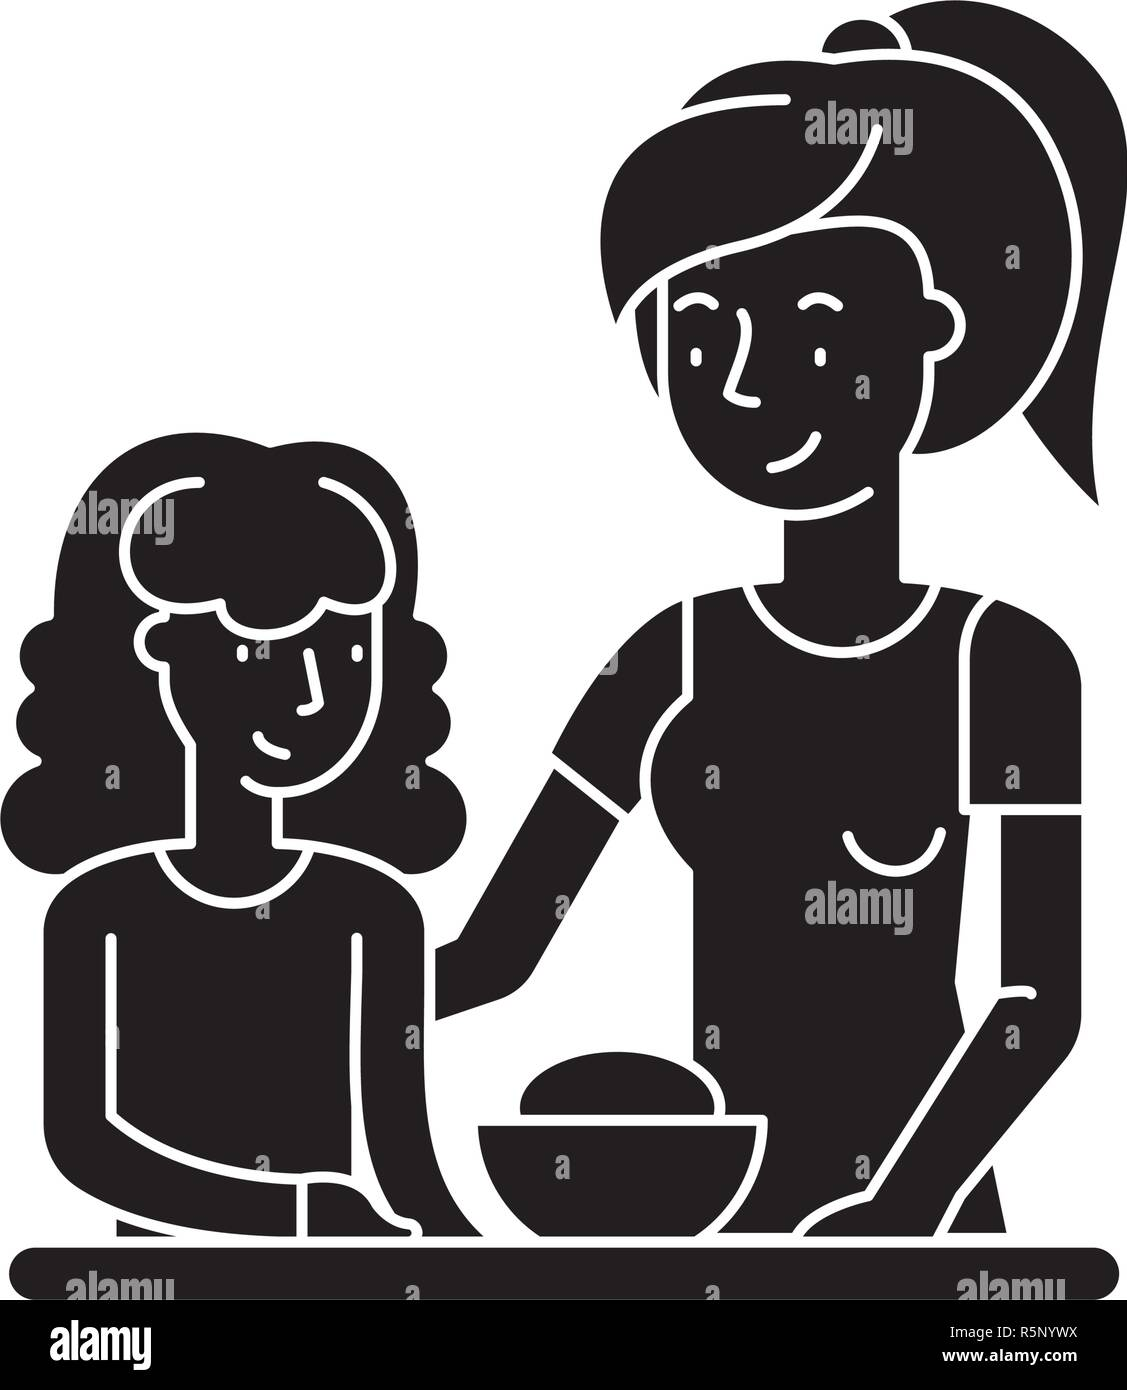 Madre E Hija Icono Negro Signo De Vectores De Fondo Aislados Madre